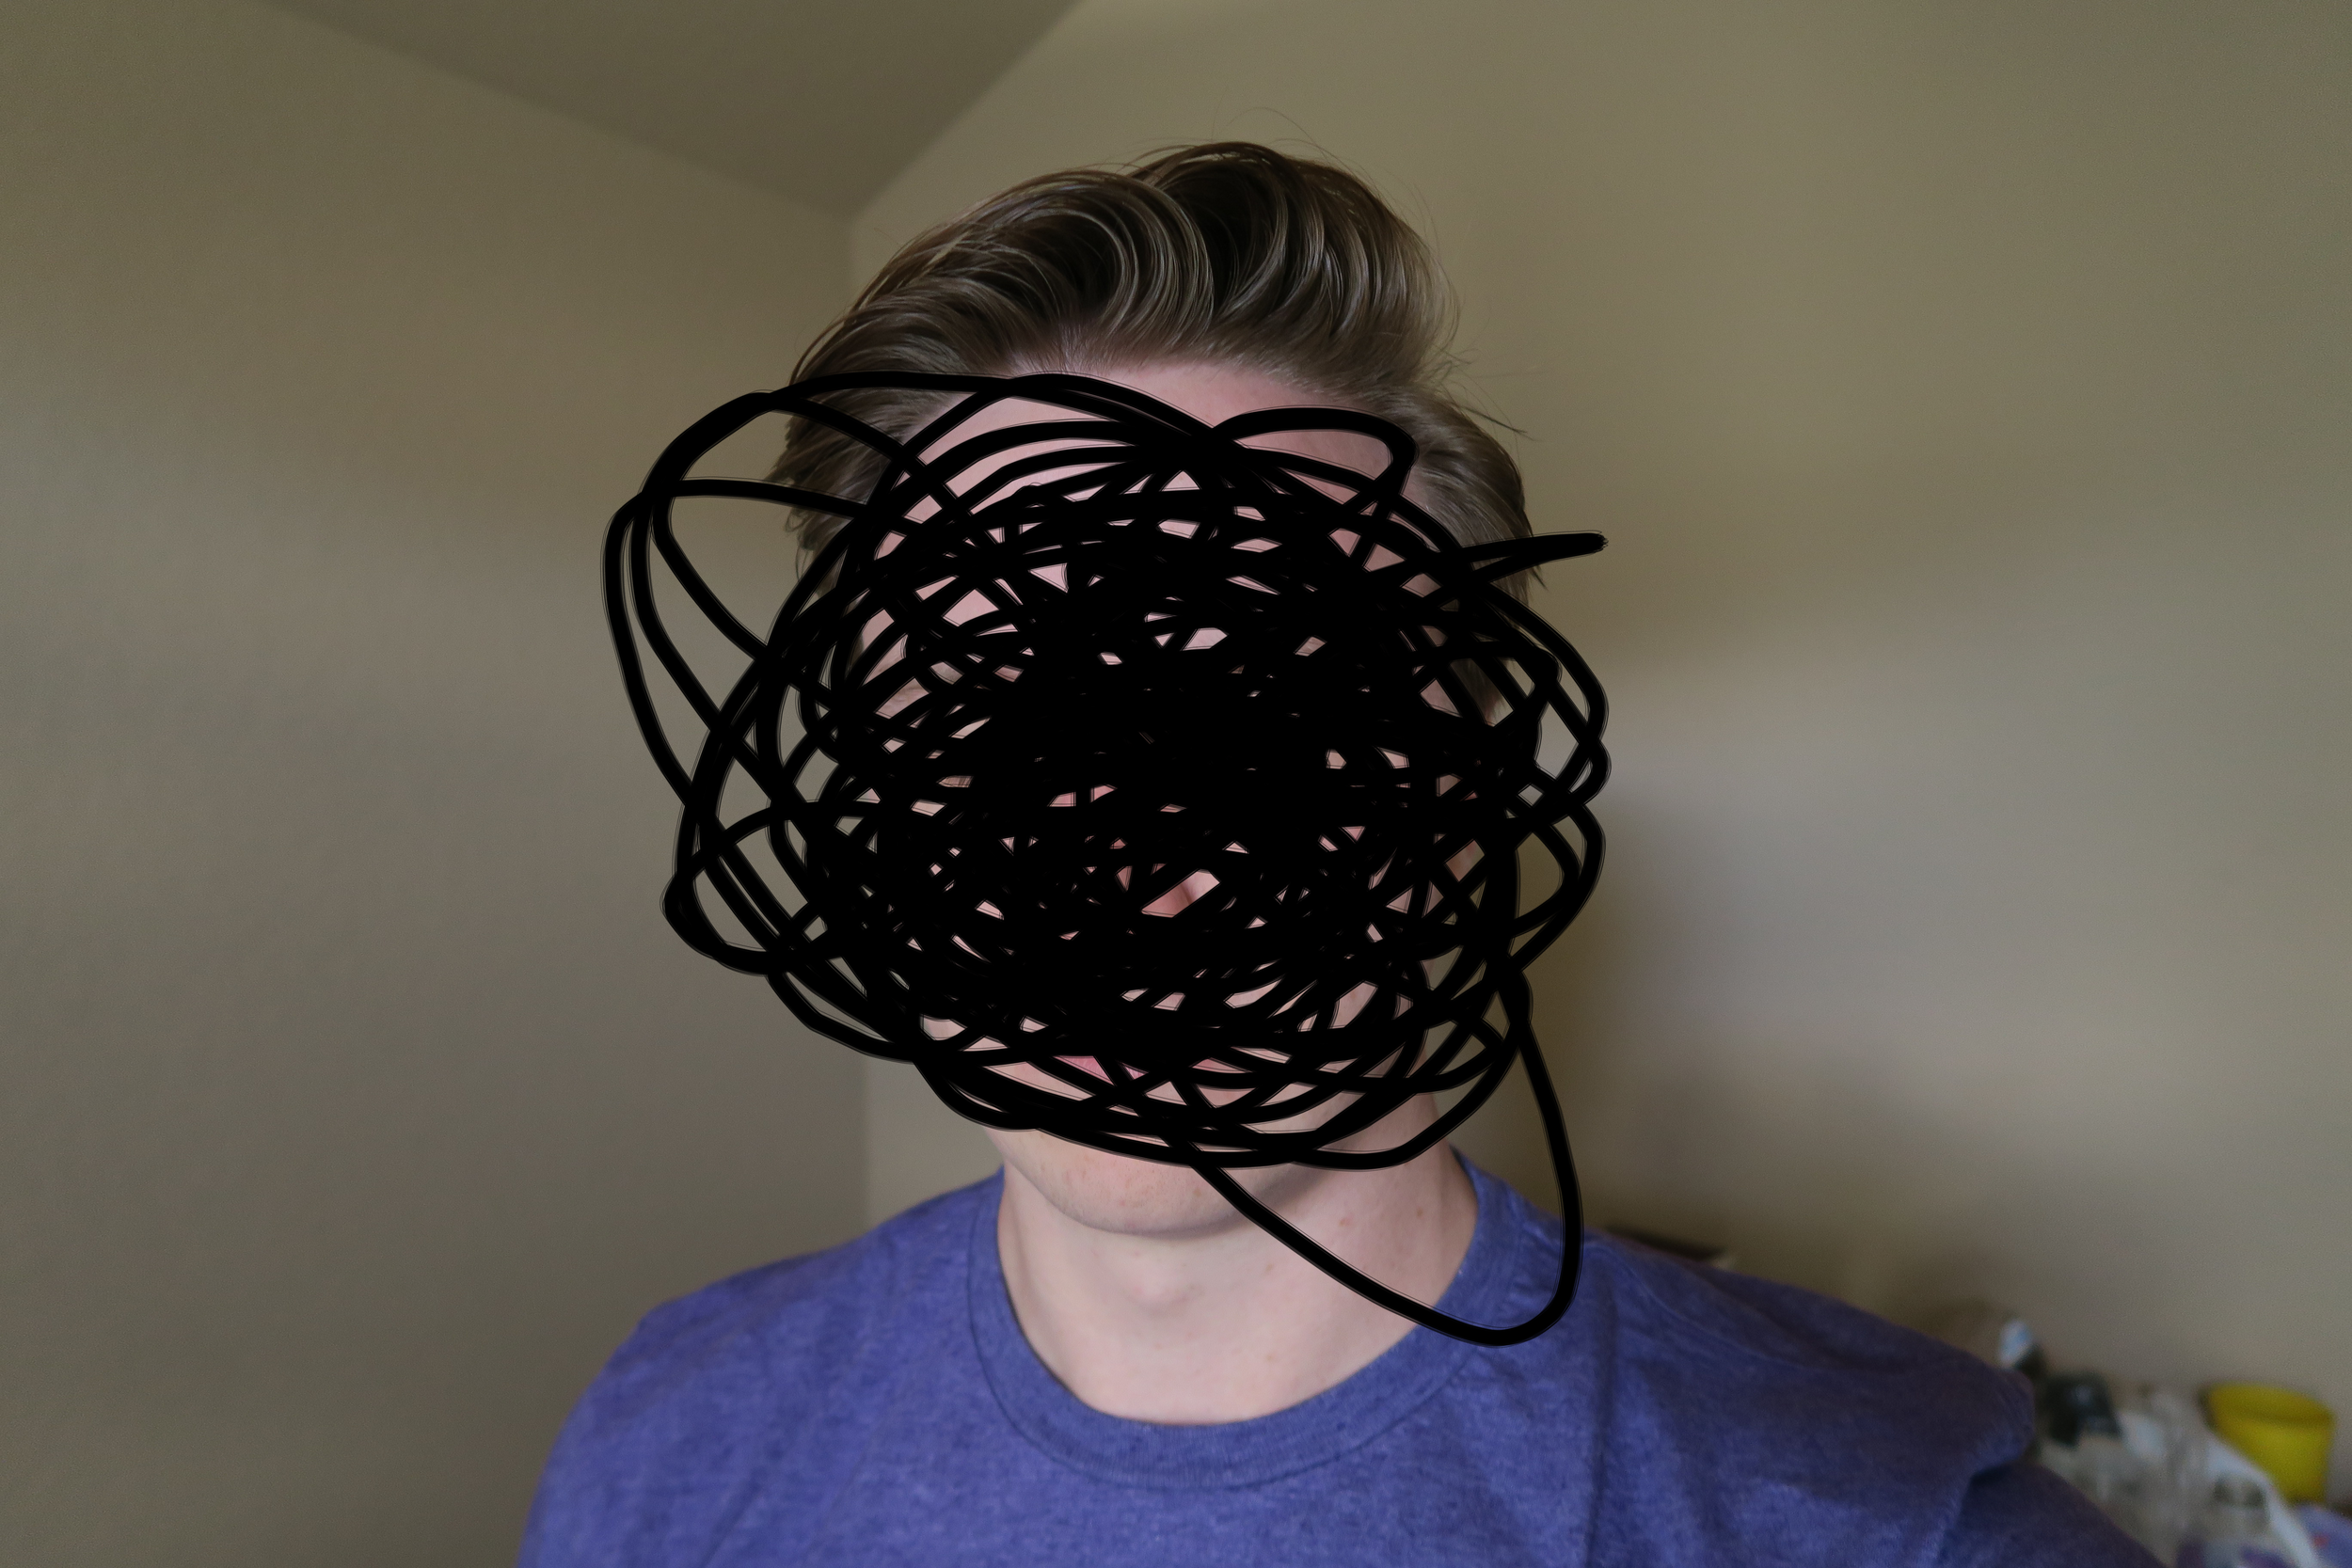 black-hole-face-test.png